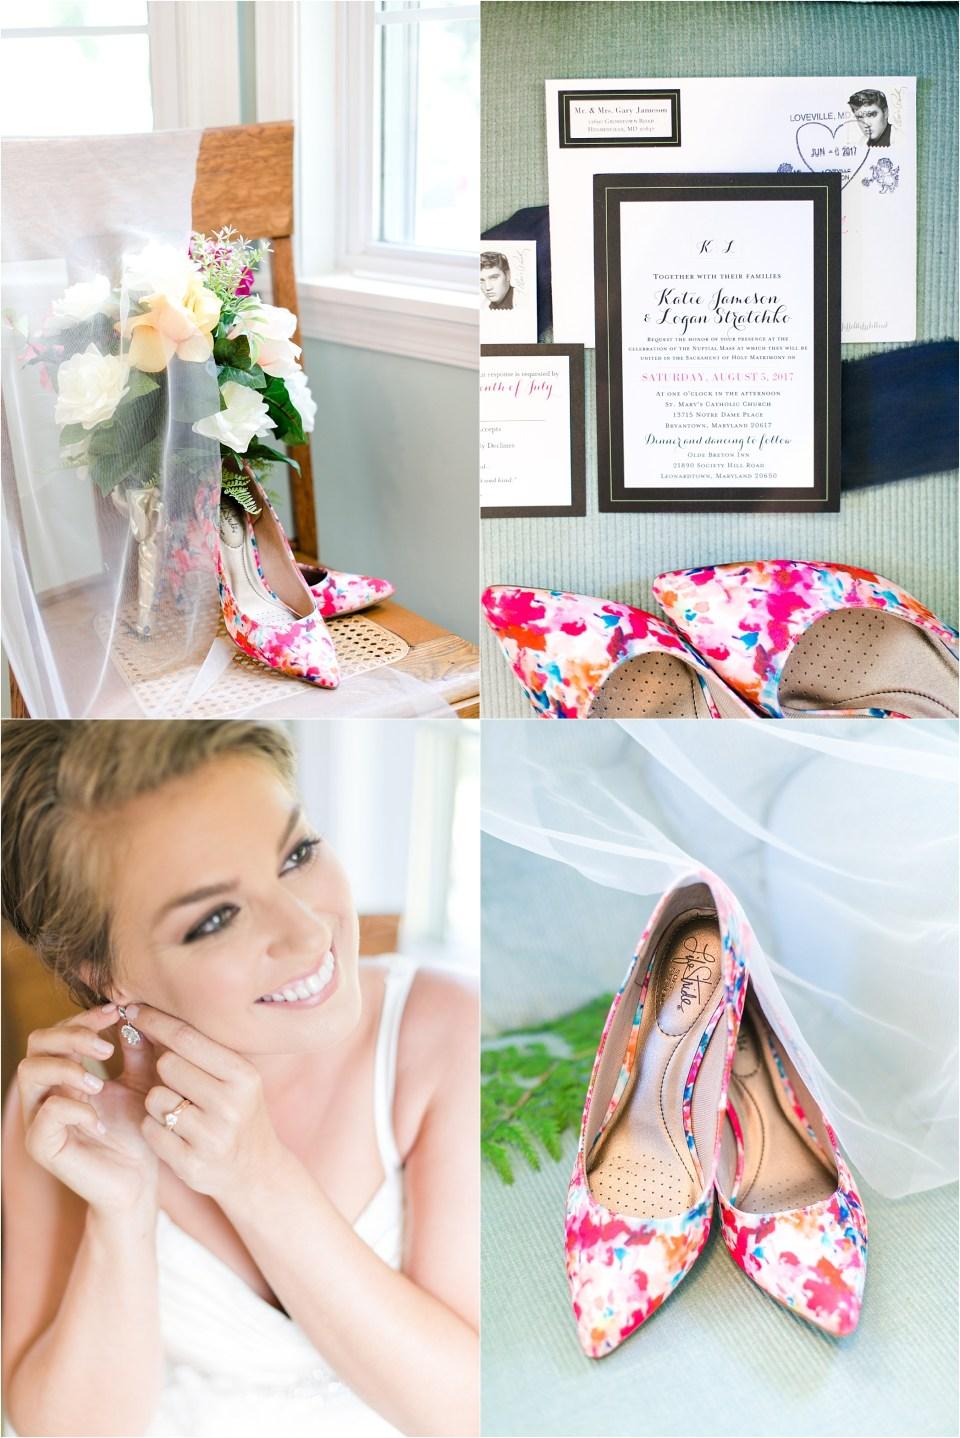 Costola-Photography-Maryland-wedding-olde-breton-inn